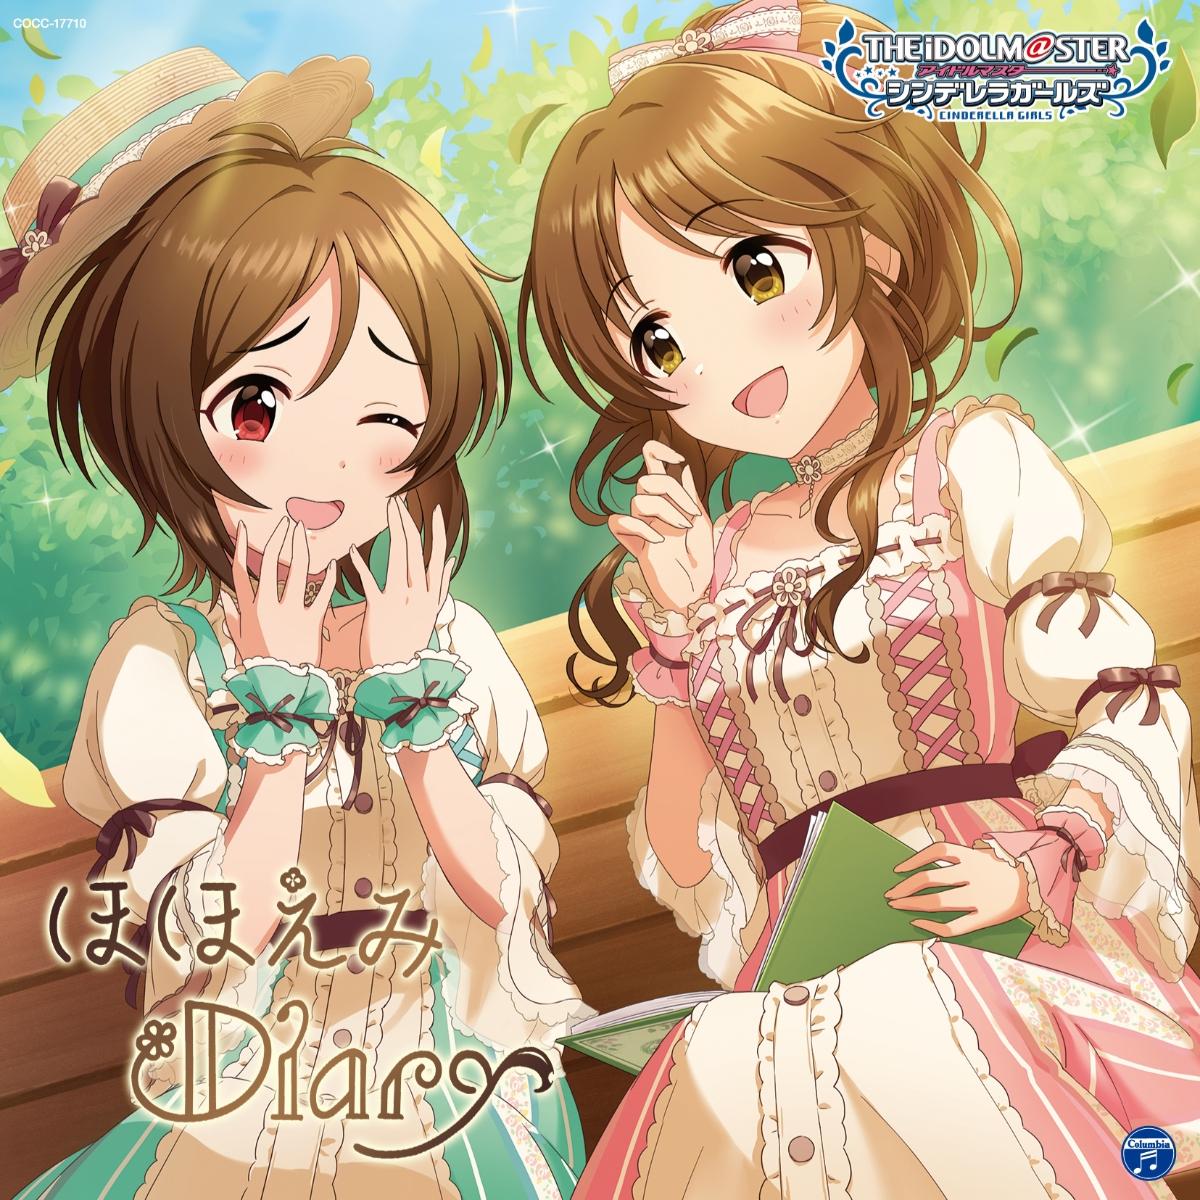 THE IDOLM@STER CINDERELLA GIRLS STARLIGHT MASTER for the NEXT! 10 Hohoemi Diary / ほほえみDiary